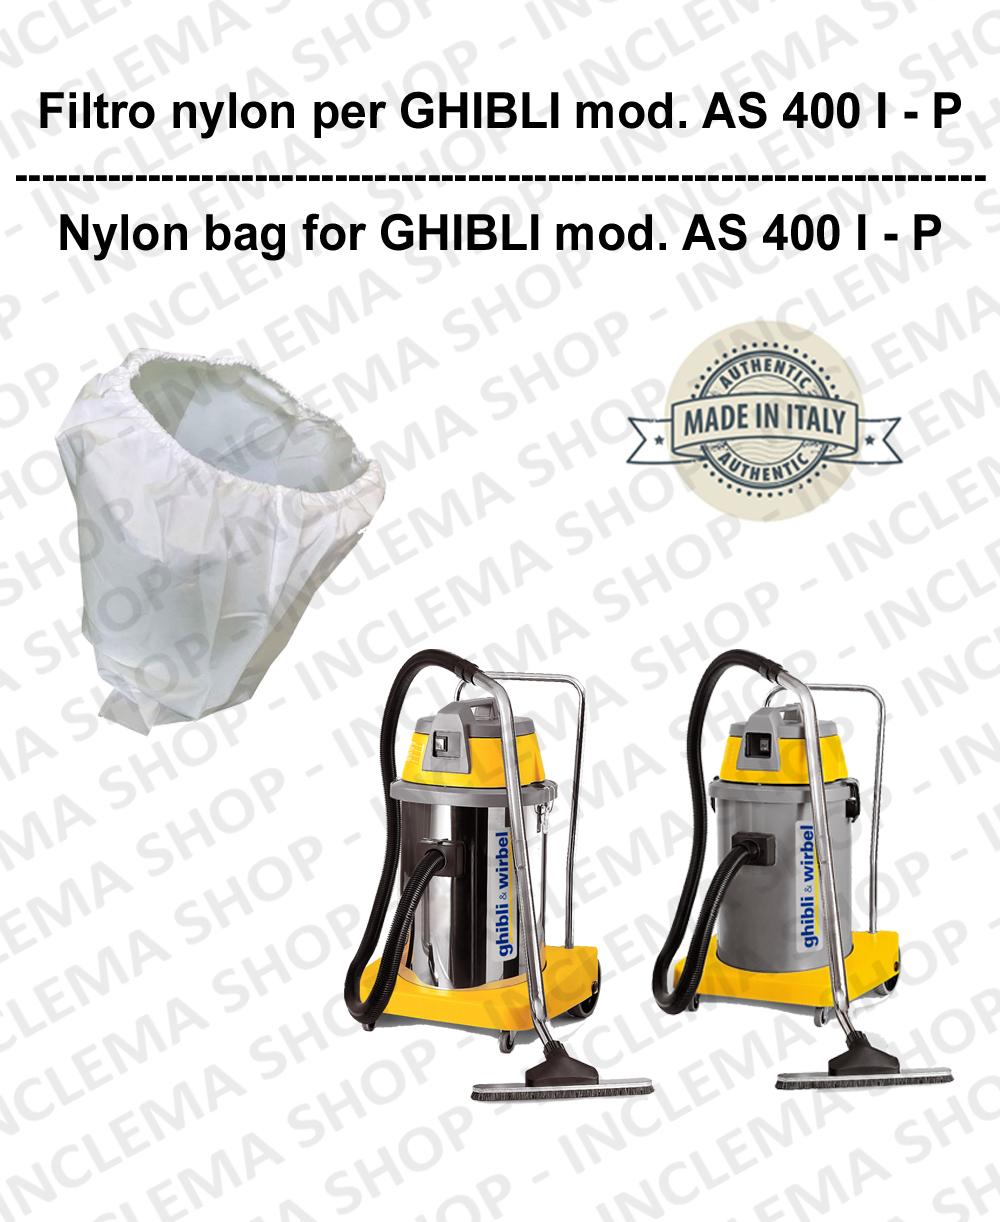 NYLON filter bag cod: 3001215 for vacuum cleaner GHIBLI model AS400